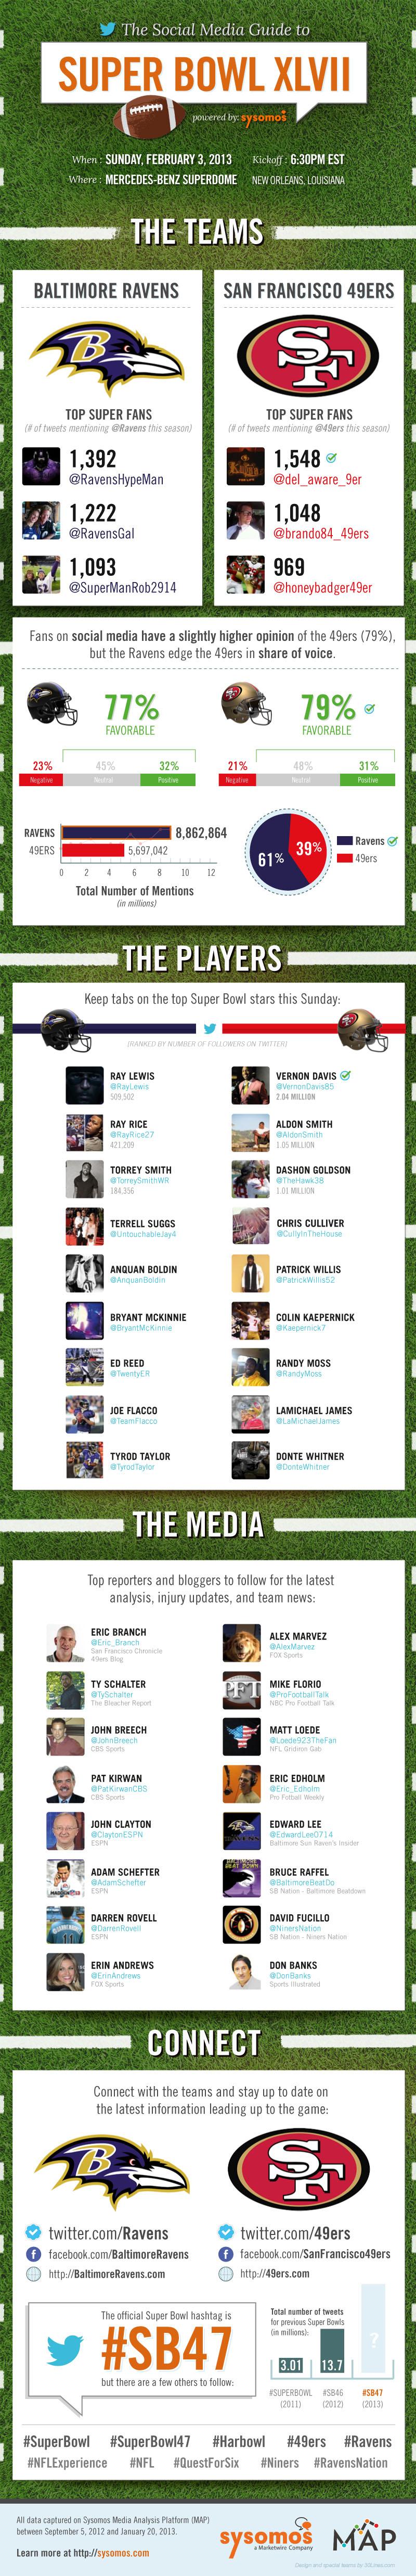 Super Bowl 47 Social Media Guide